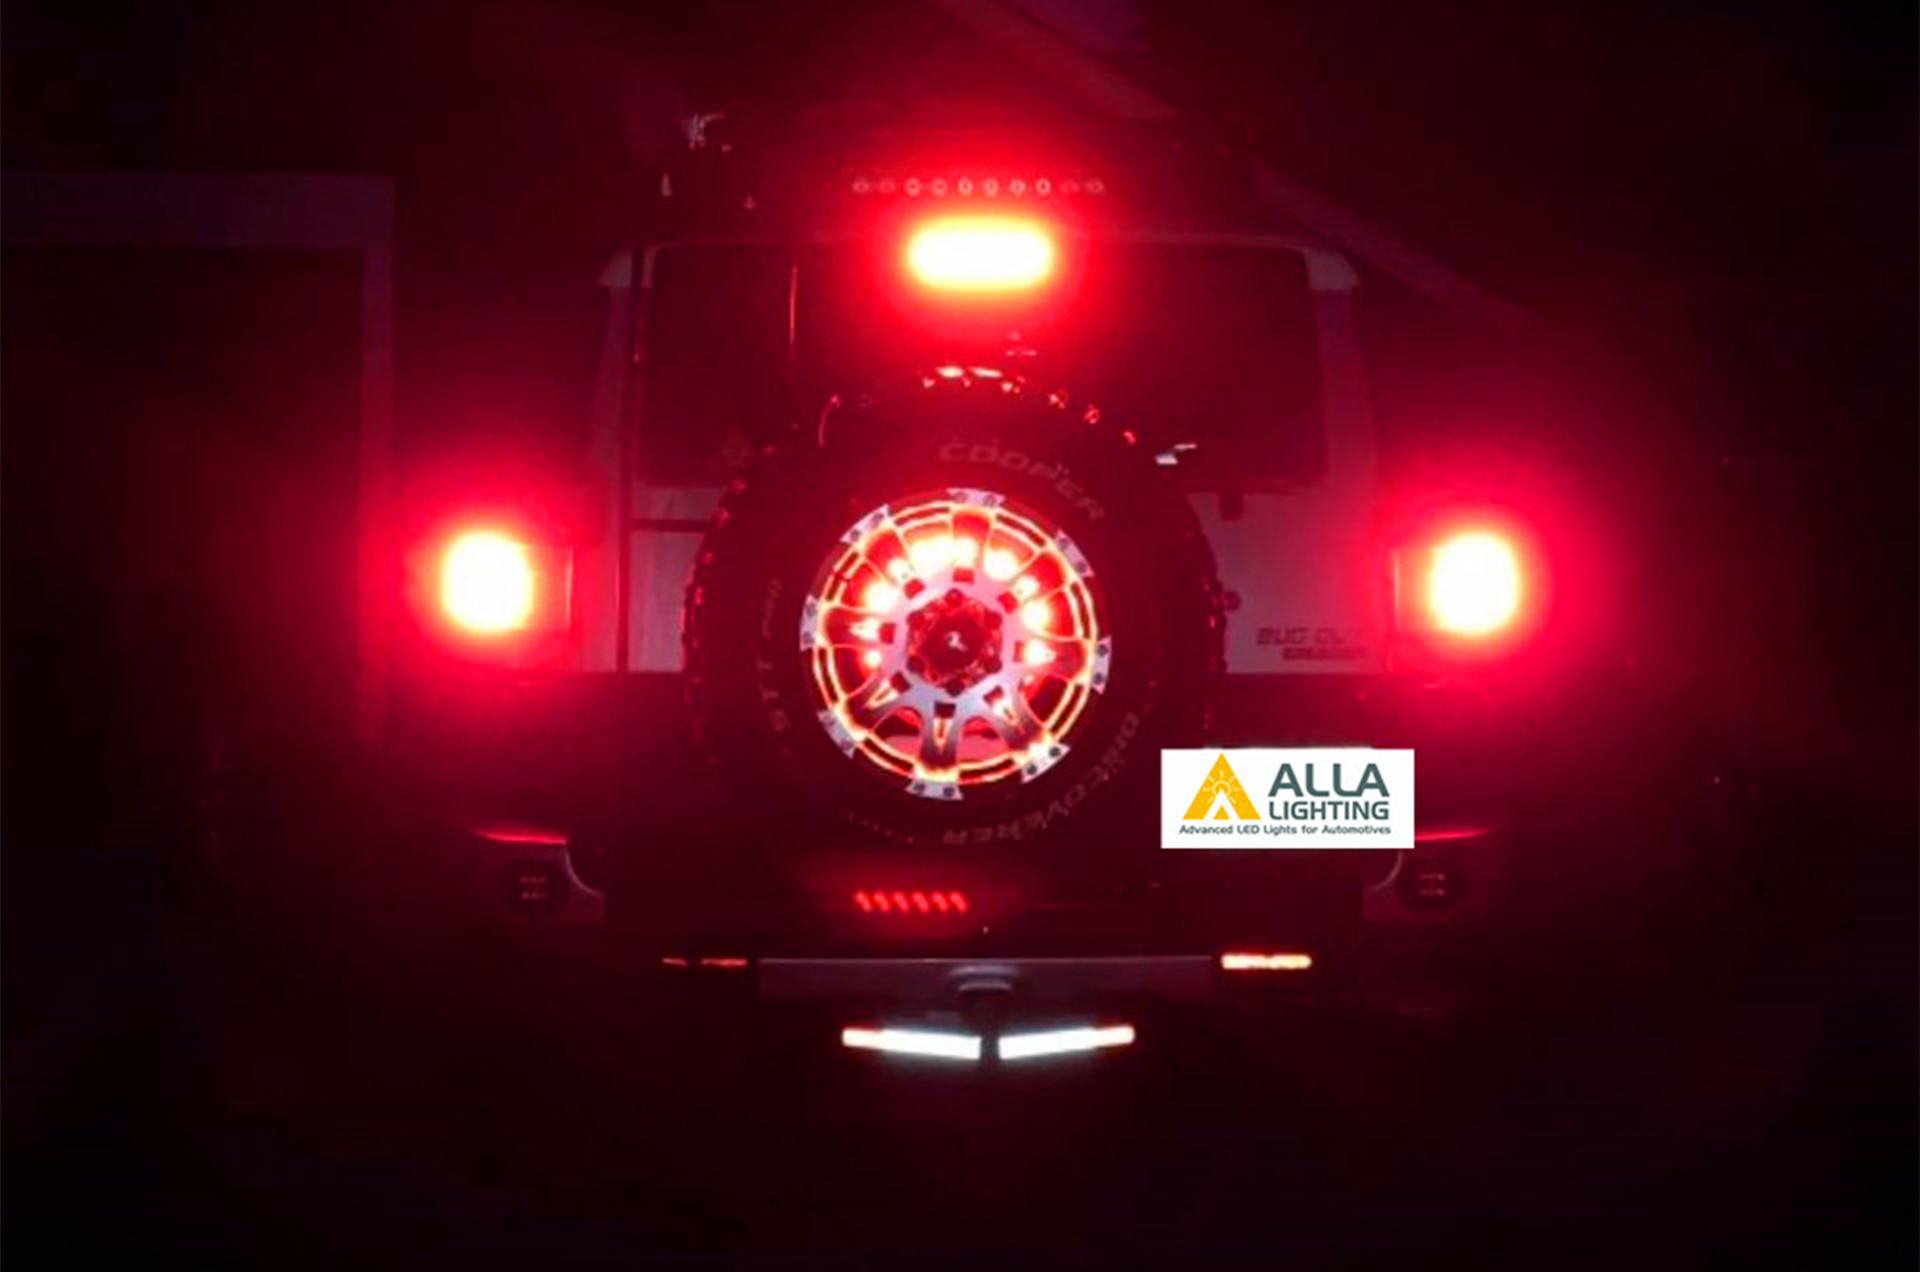 Toyota-FJ-Cruiser-Brake-Tail-Lights-7443-Red-LED-Bulbs-Cars-SUVs-12V